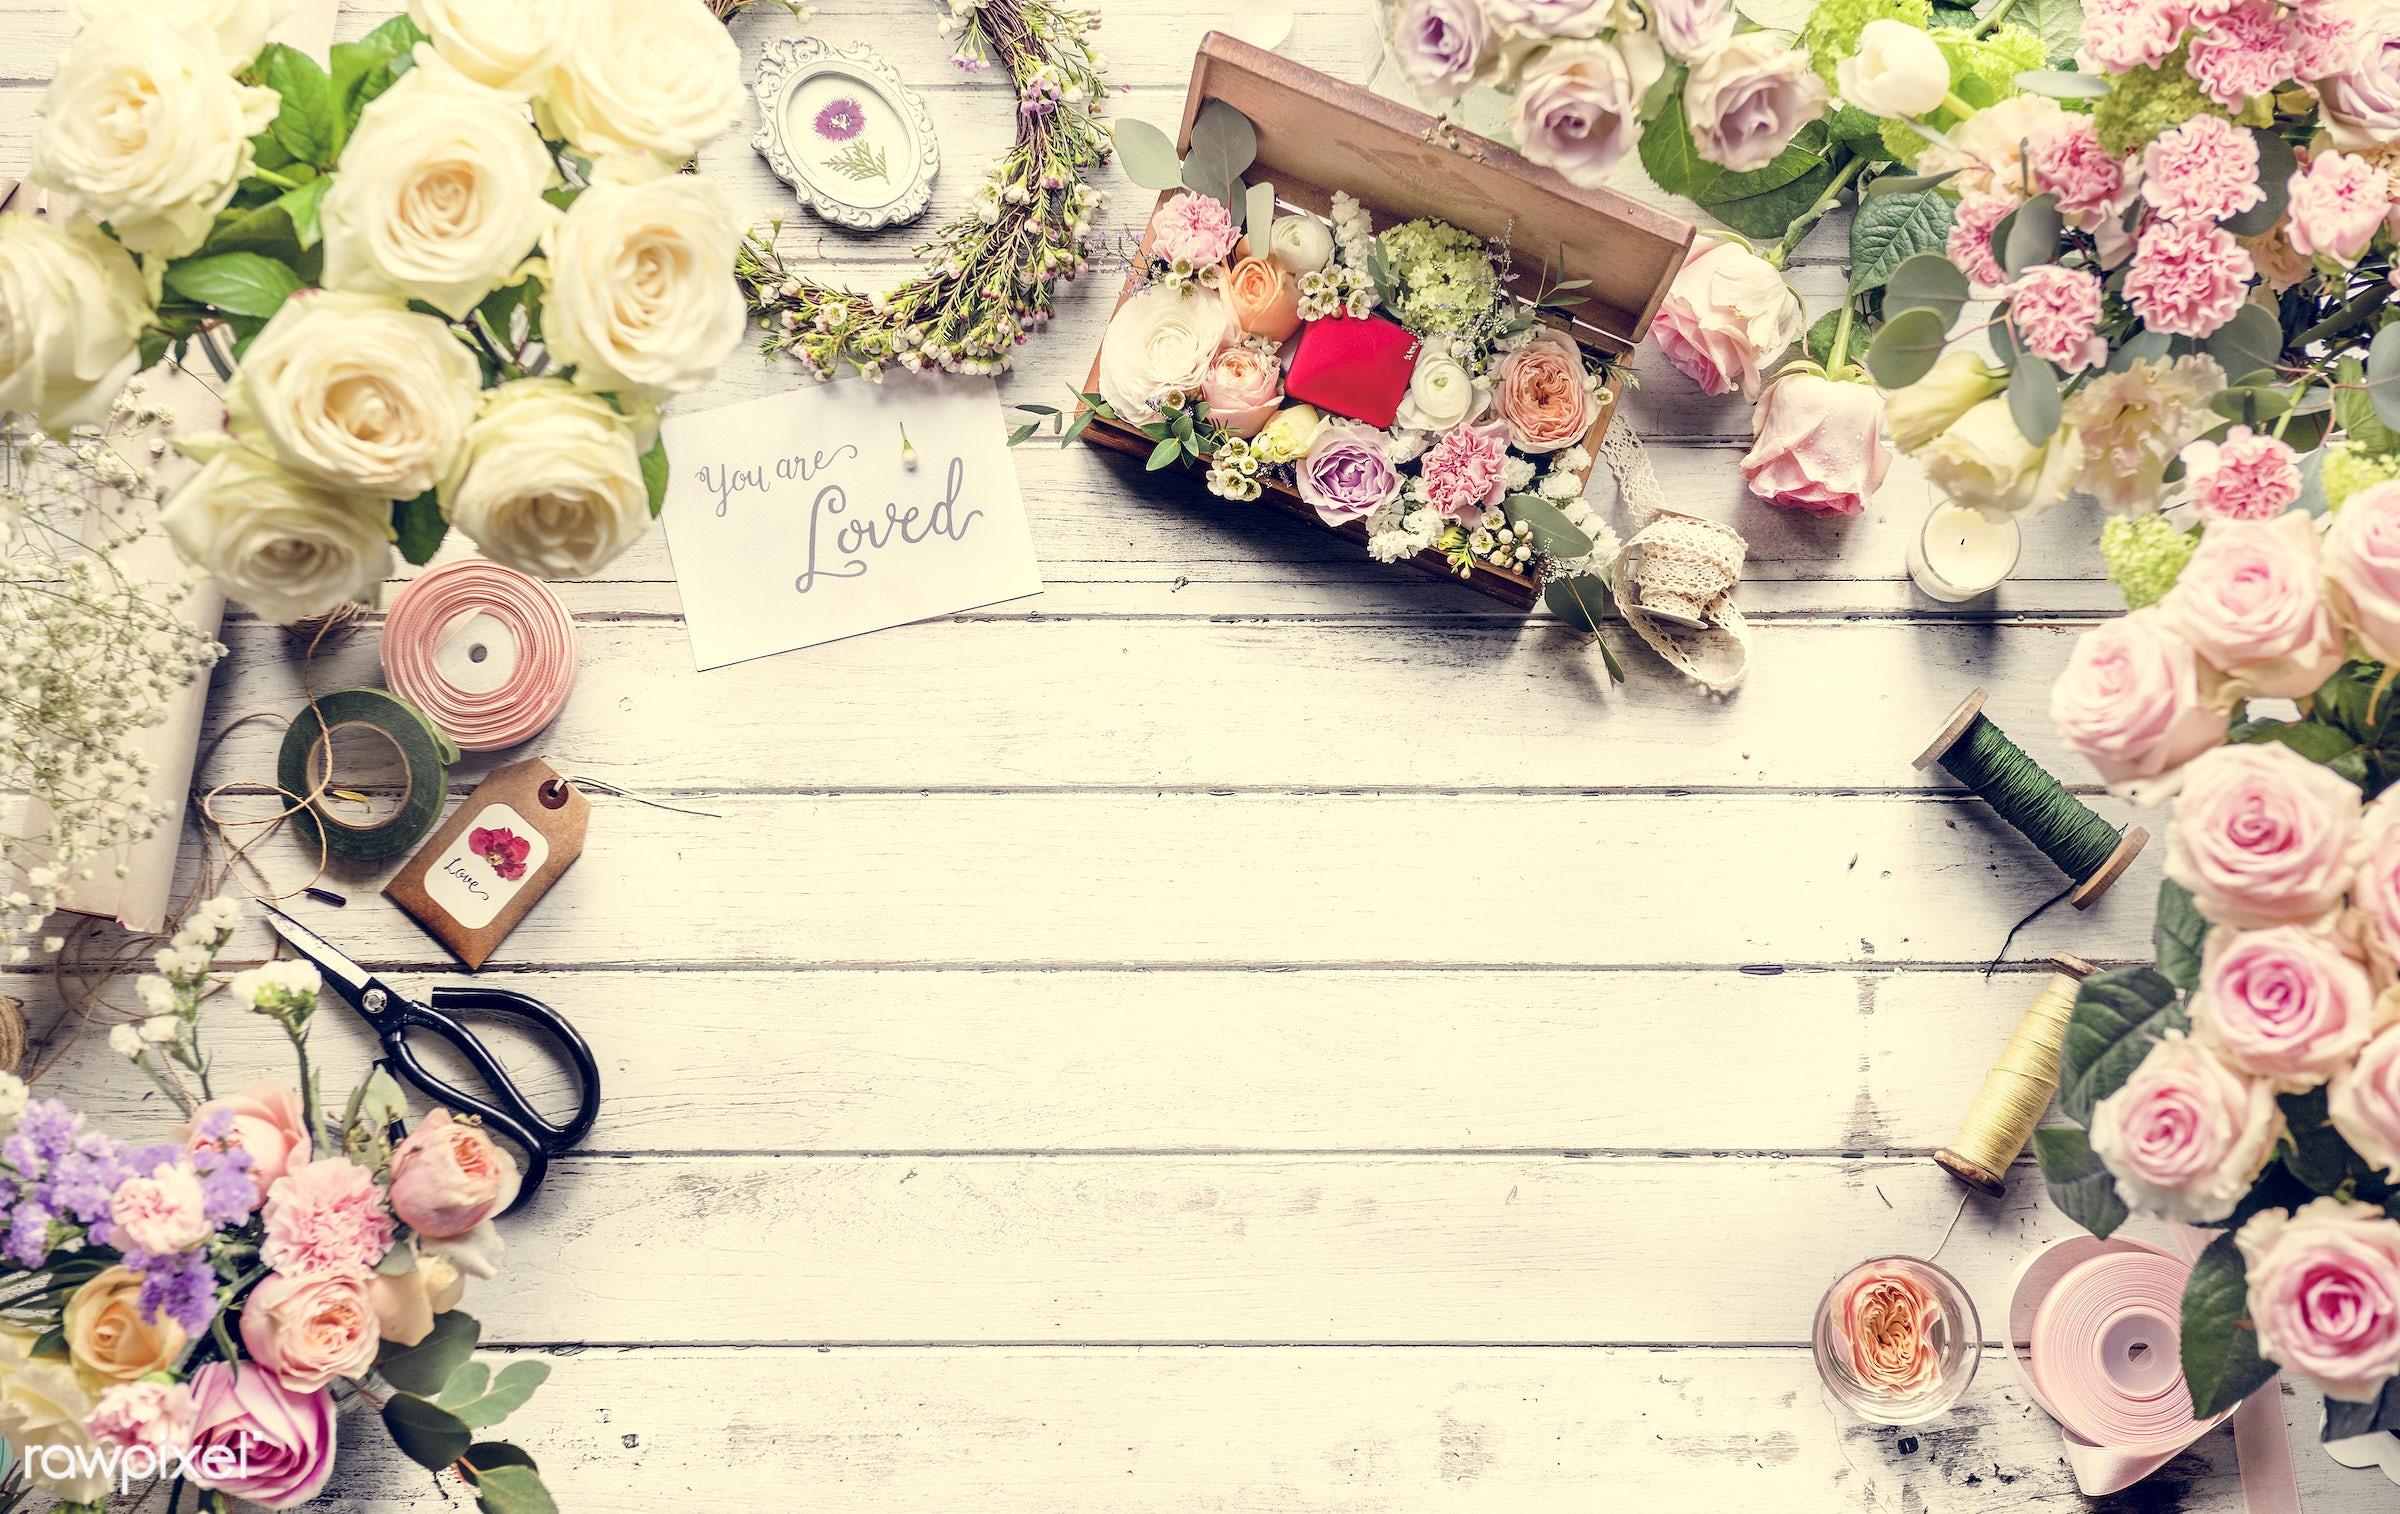 bouquet, nobody, detail, show, decor, are, nature, card, flowers, work, carnation, florist, rose, arrangement, statis, twine...